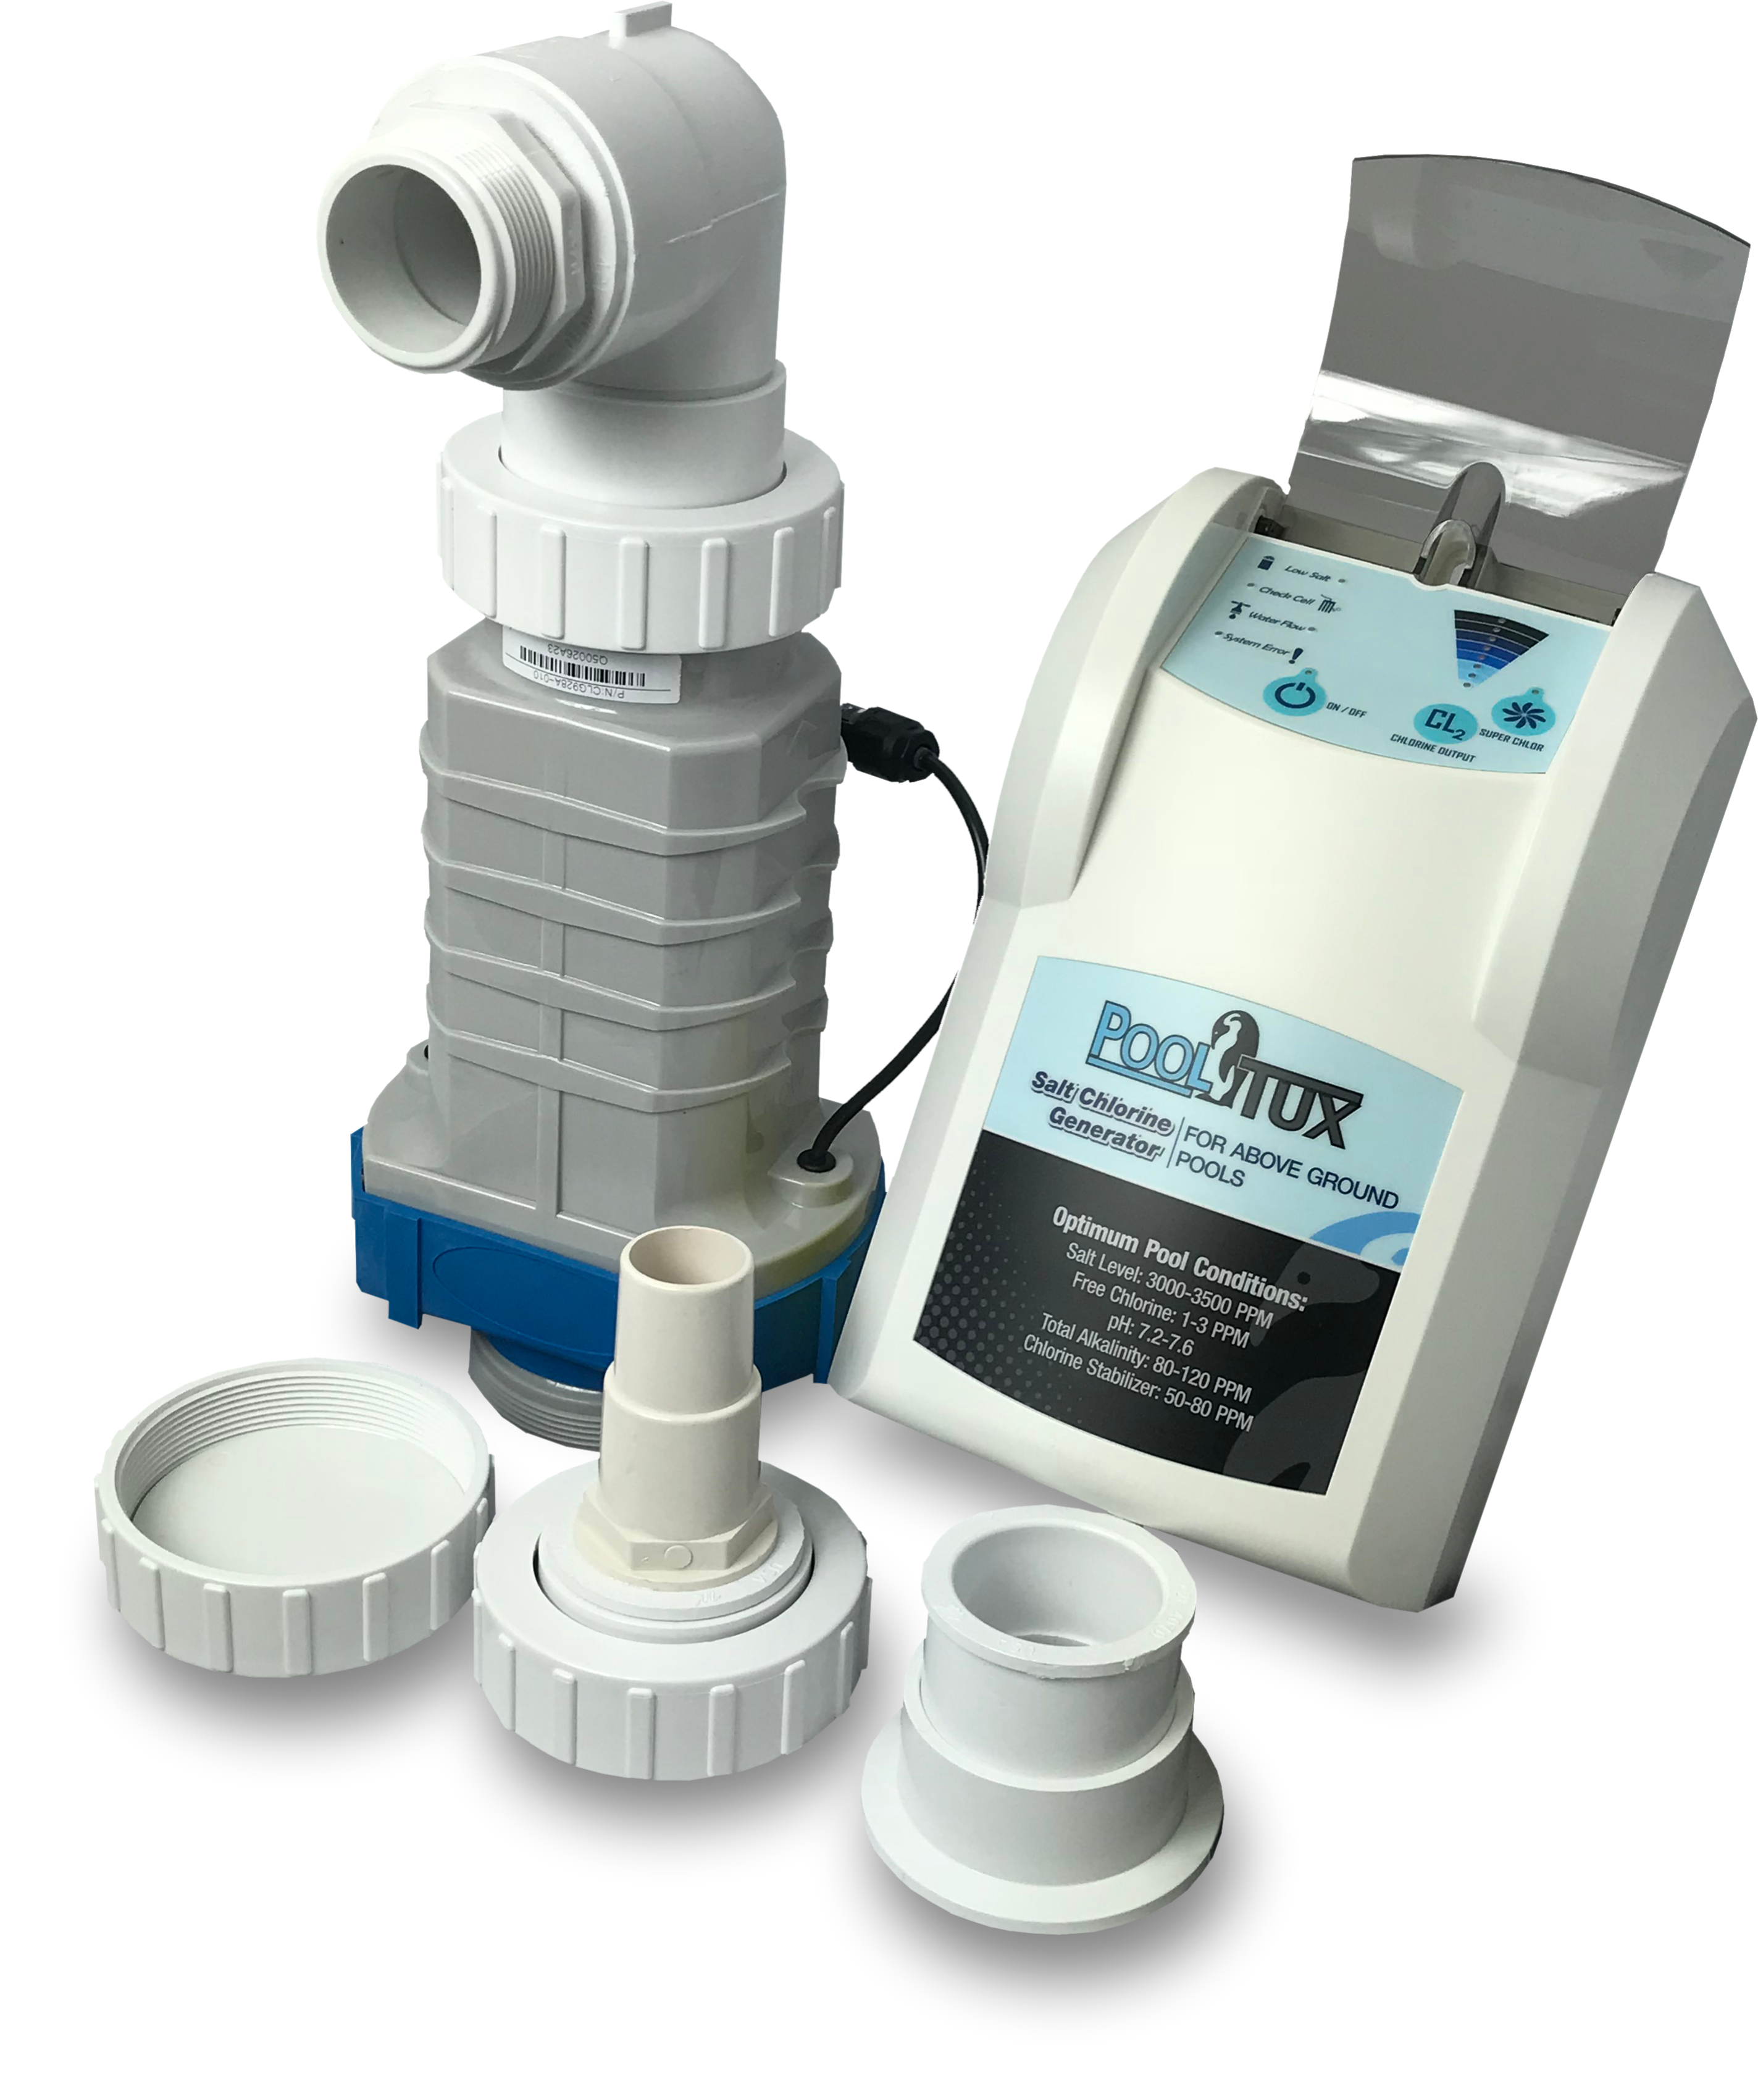 Pooltux 28k Gallon Salt Chlorine Generator For Above